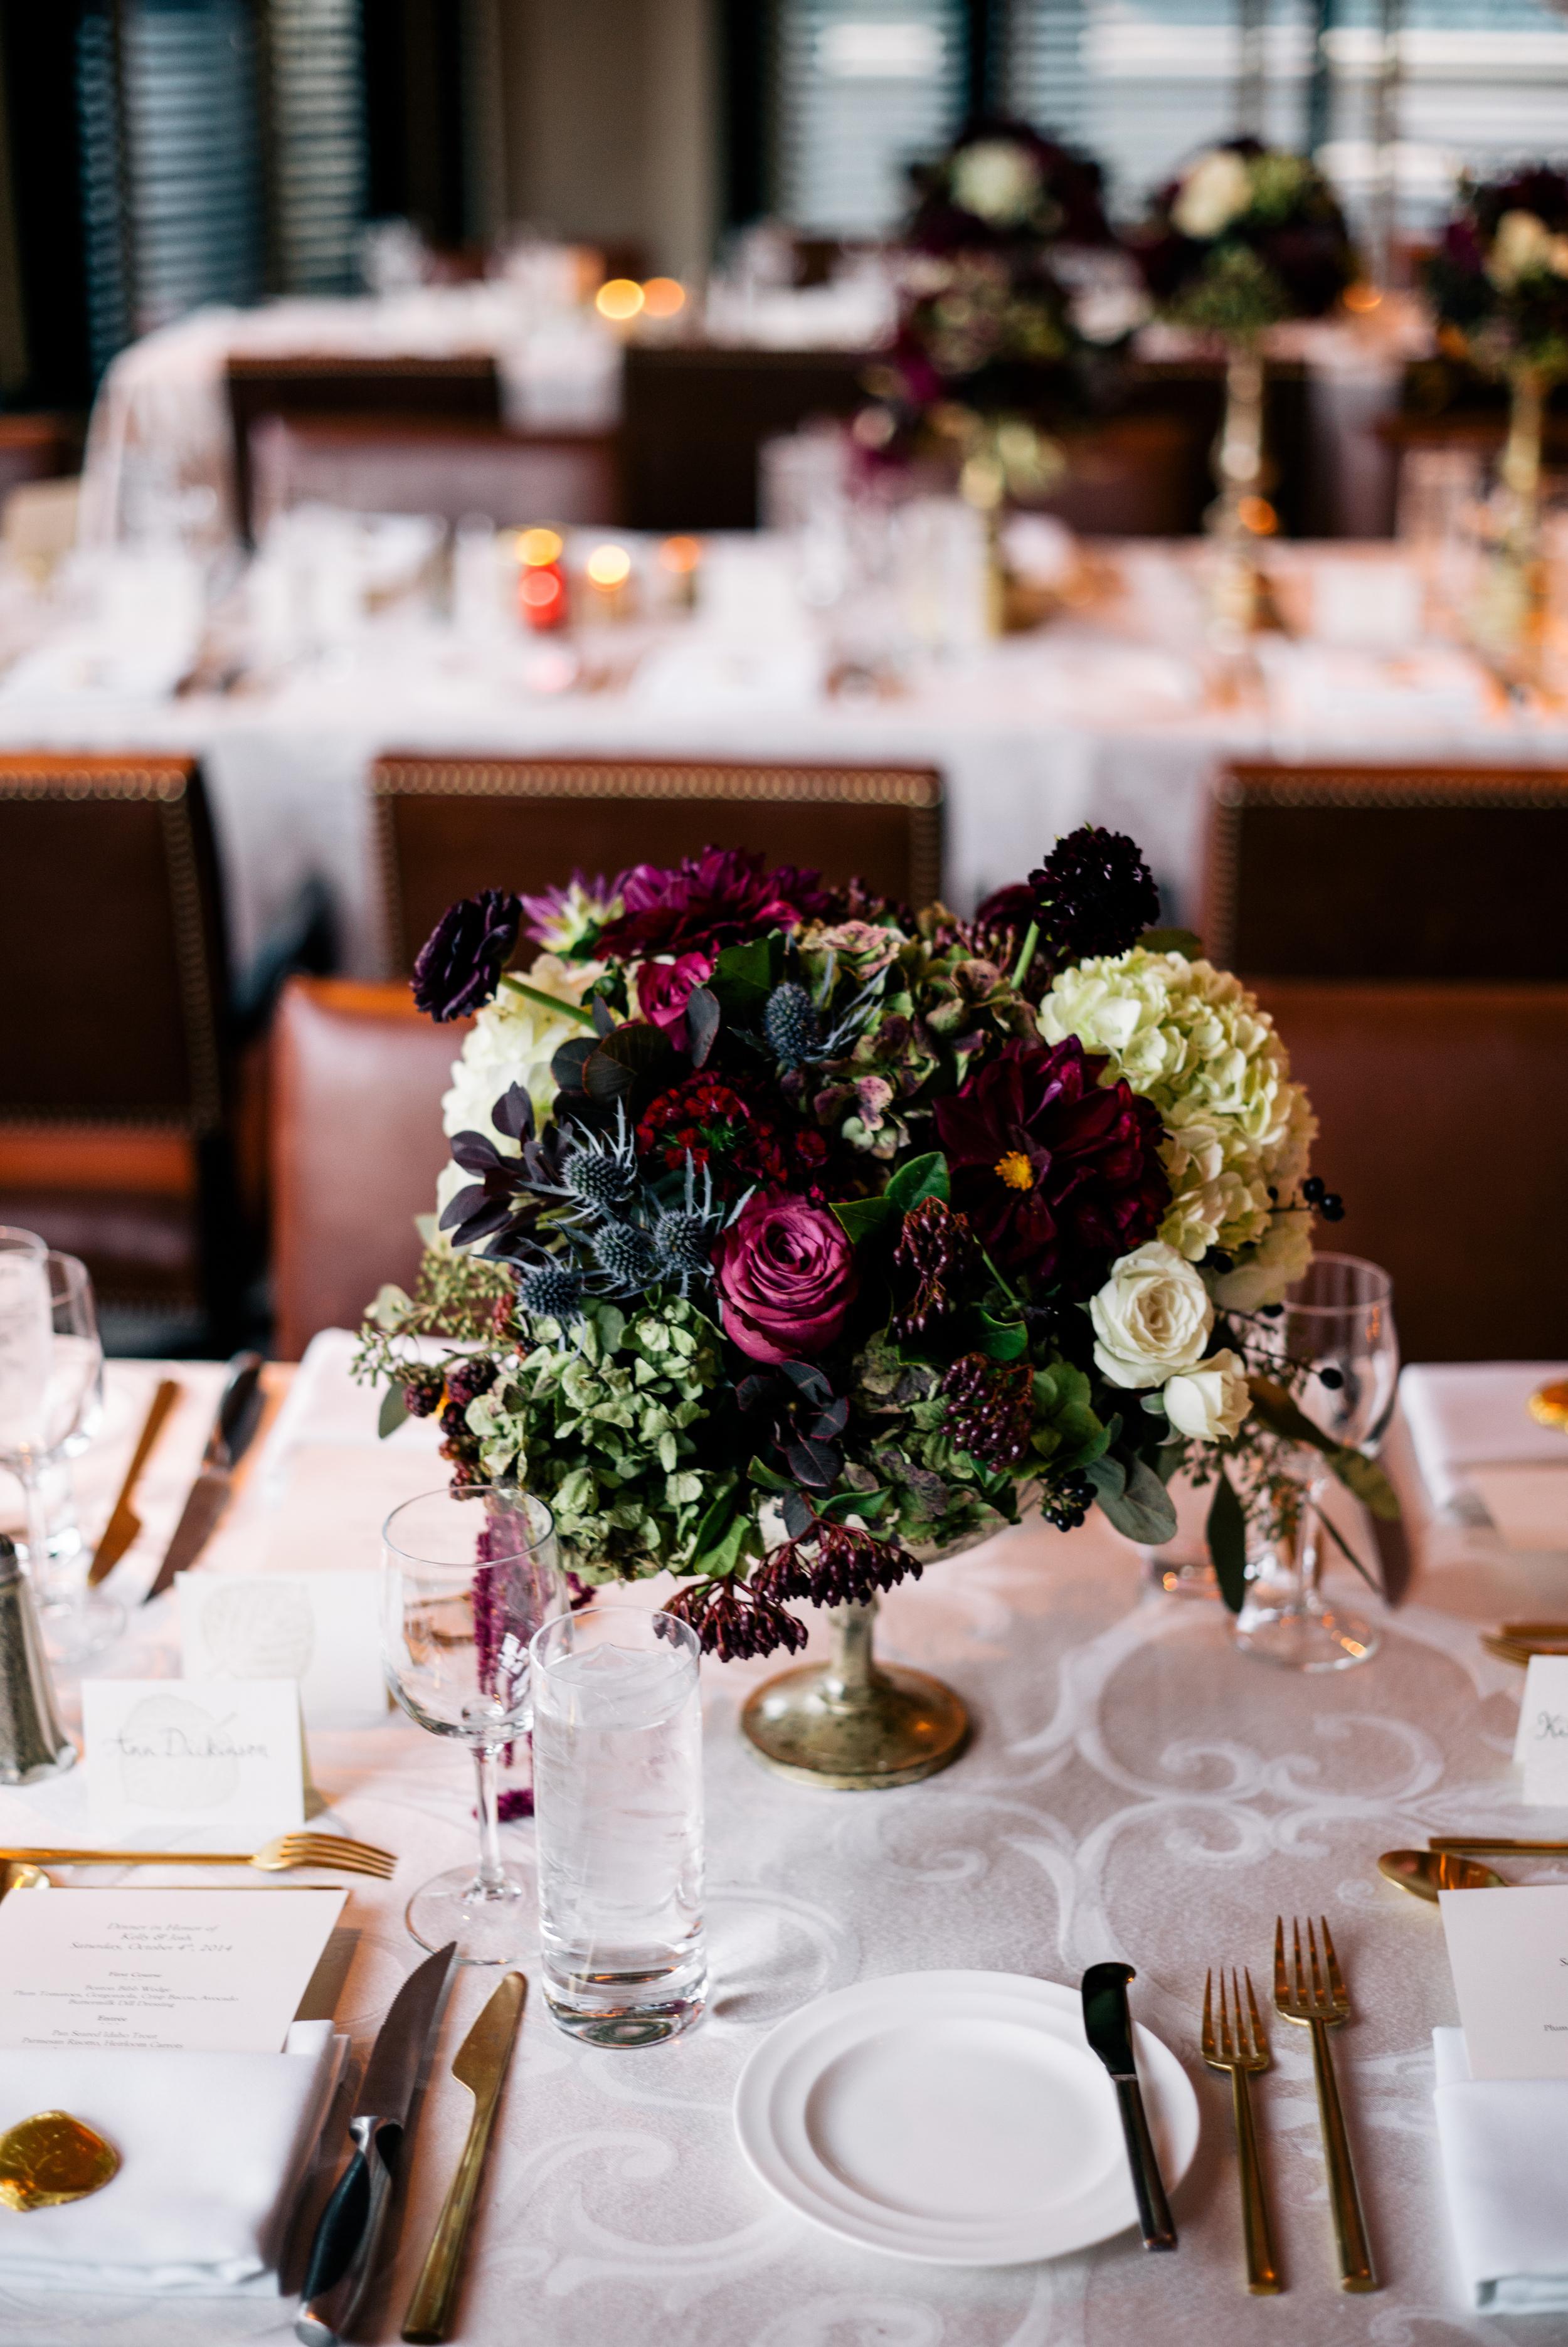 Kelly + Josh   Fall wedding at the Park Hyatt Beaver Creek   Florals by the Perfect Petal   Ash Imagery